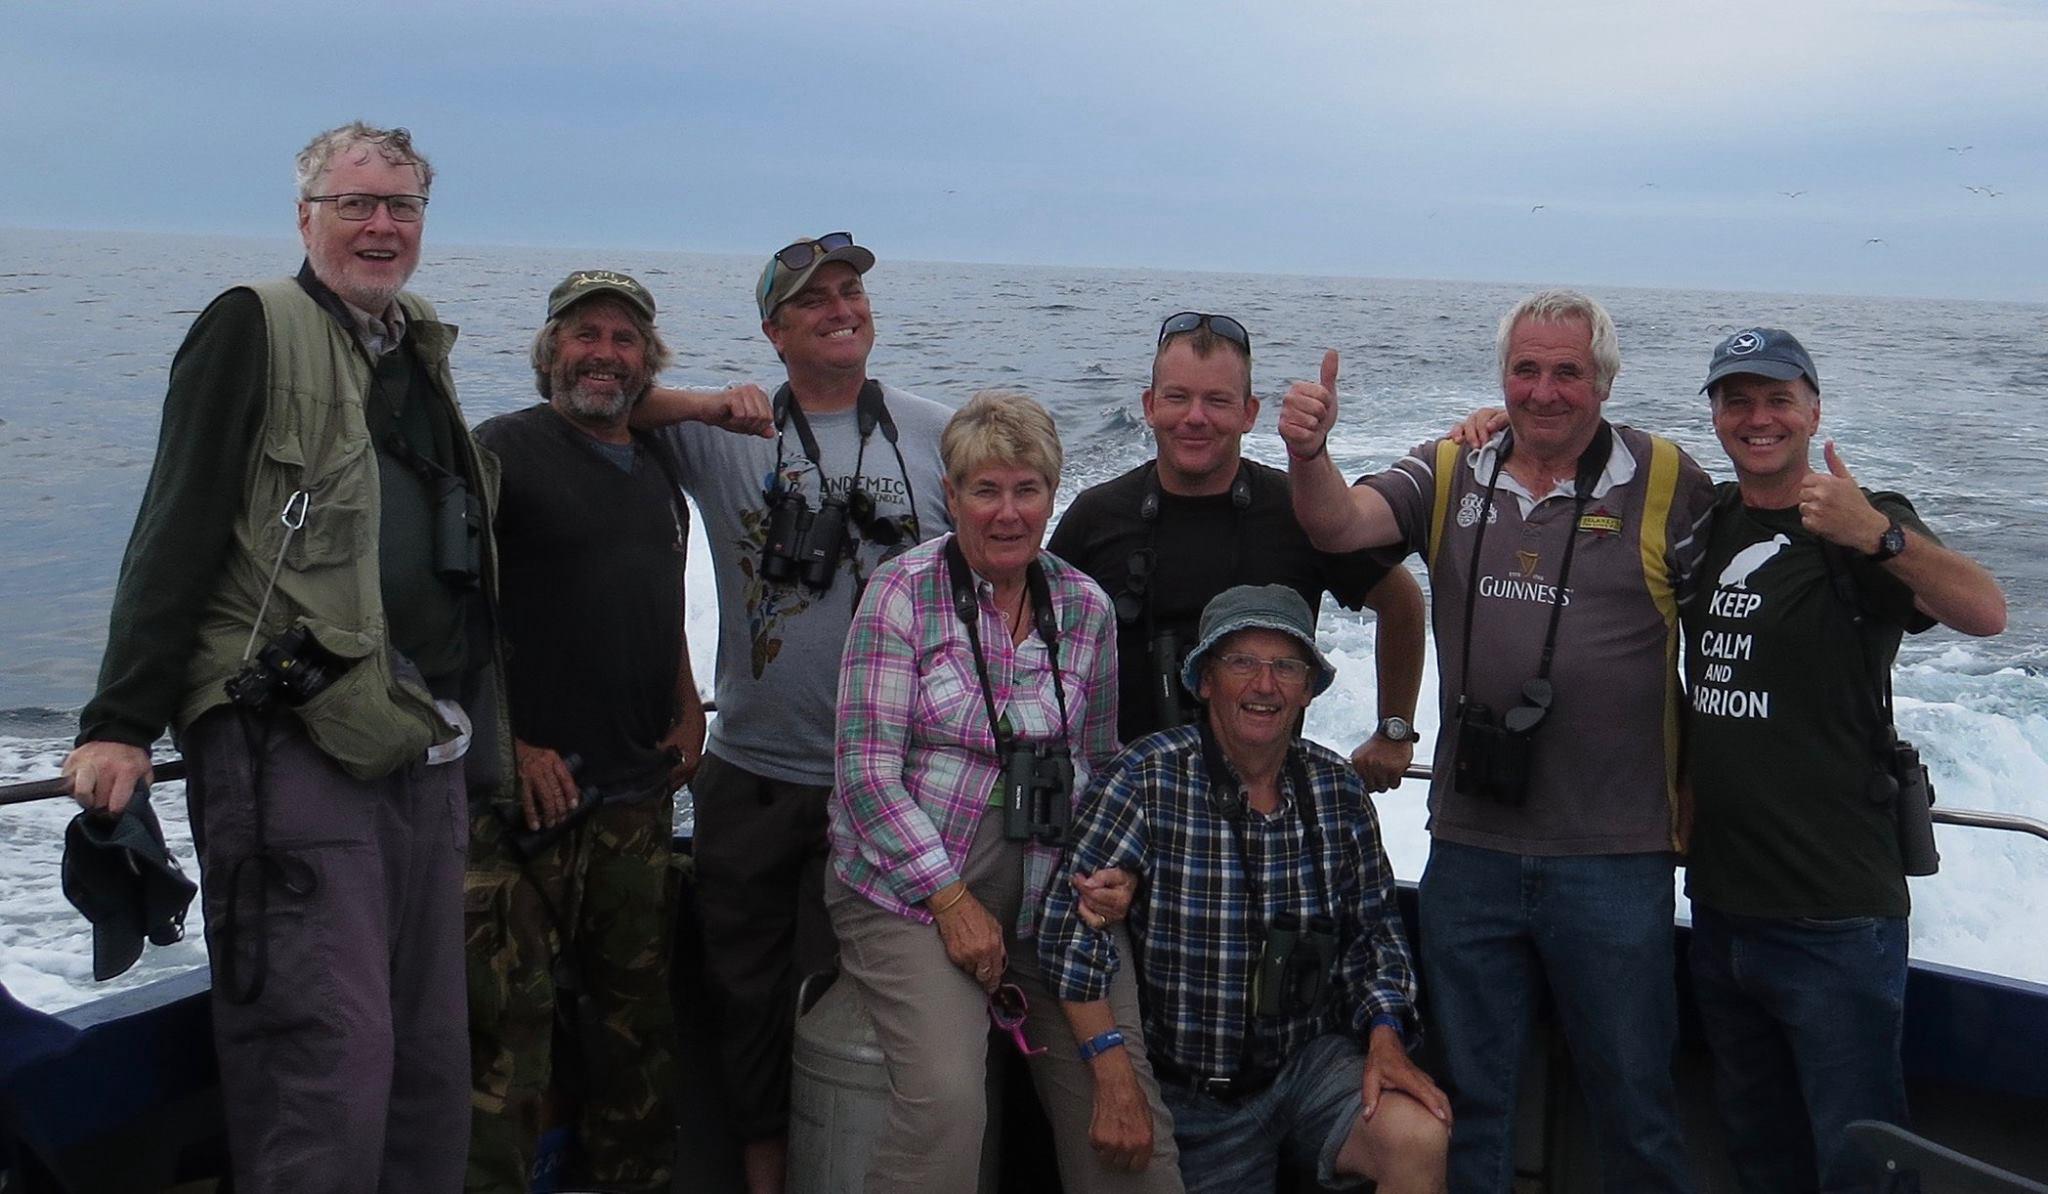 The Wilson's Crew - (L to R) - Julian Medland, Mark Guppy, Mark Lawlor, Jill Froome, Jamie Hooper, Vic Froome, Chris Mourant, Wayne Turner